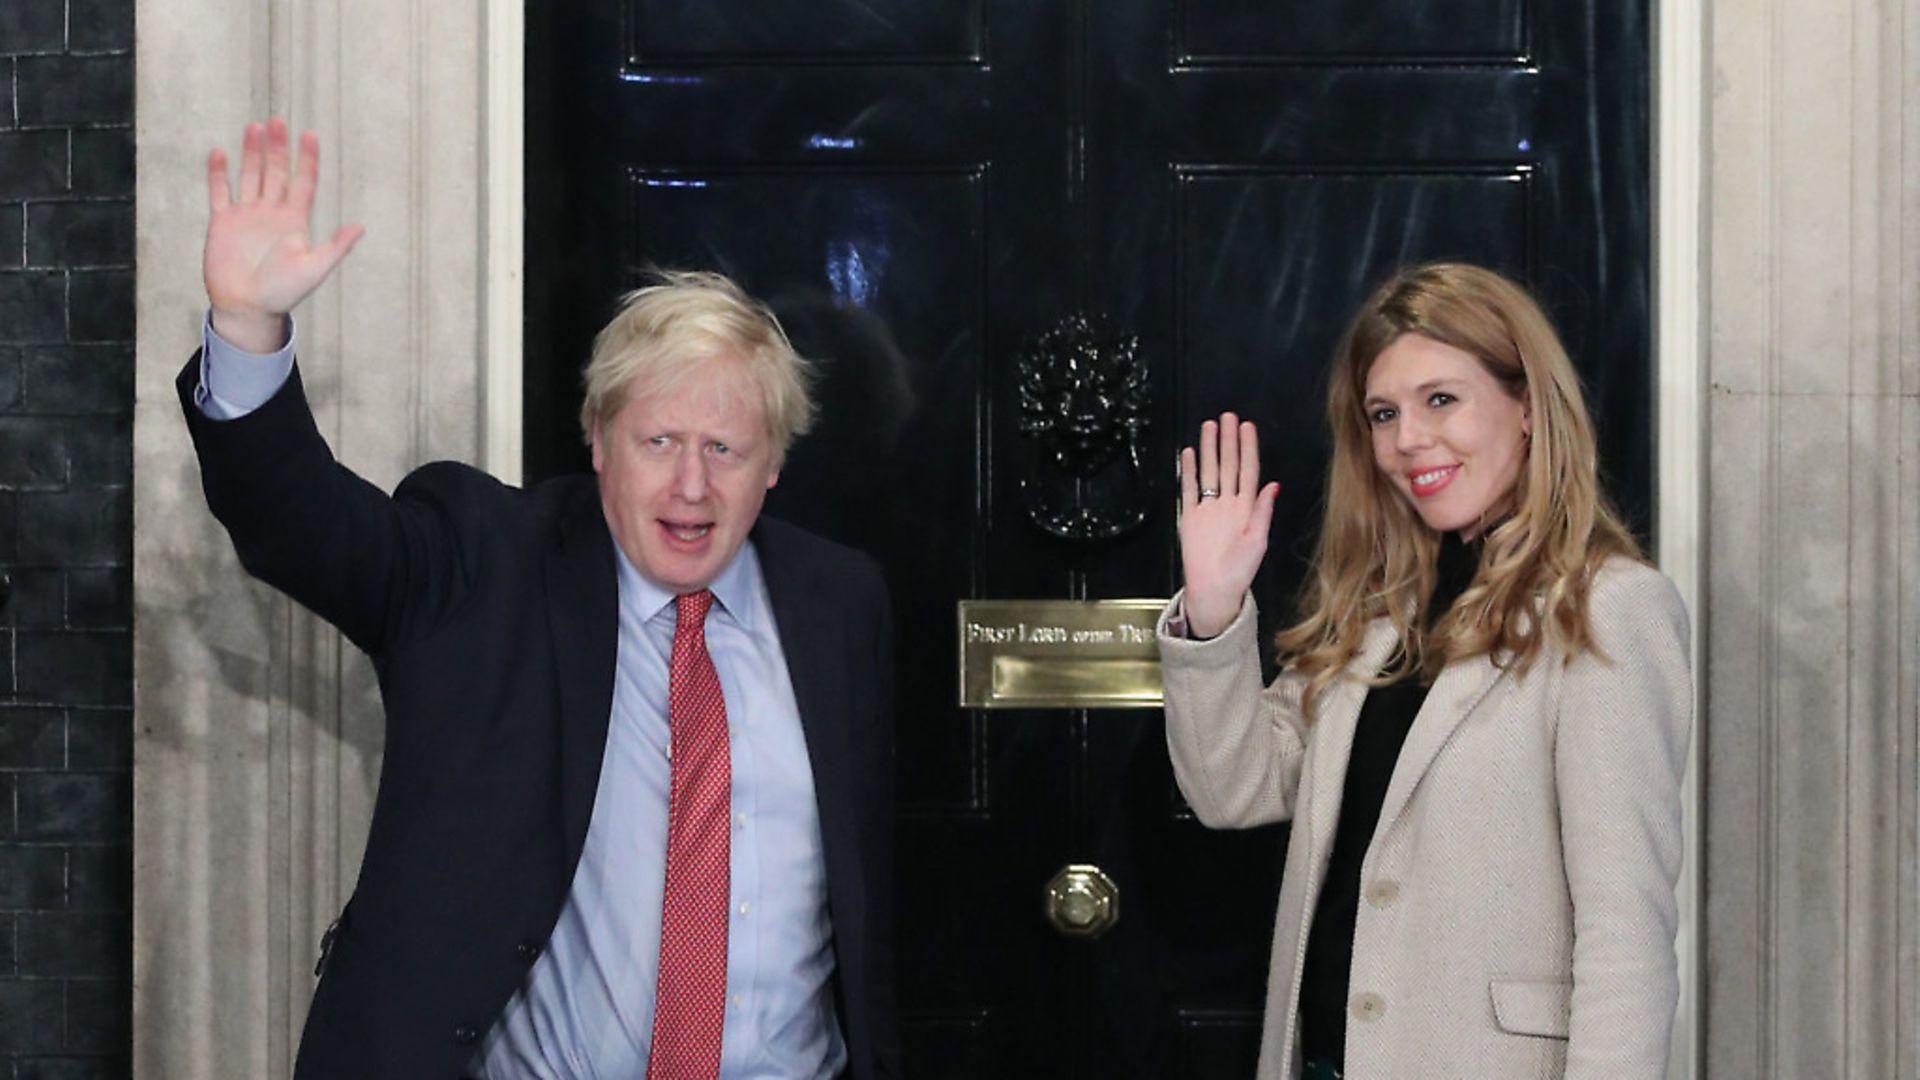 Prime Minister Boris Johnson and his girlfriend Carrie Symonds. Photograph: Yui Mok/PA. - Credit: PA